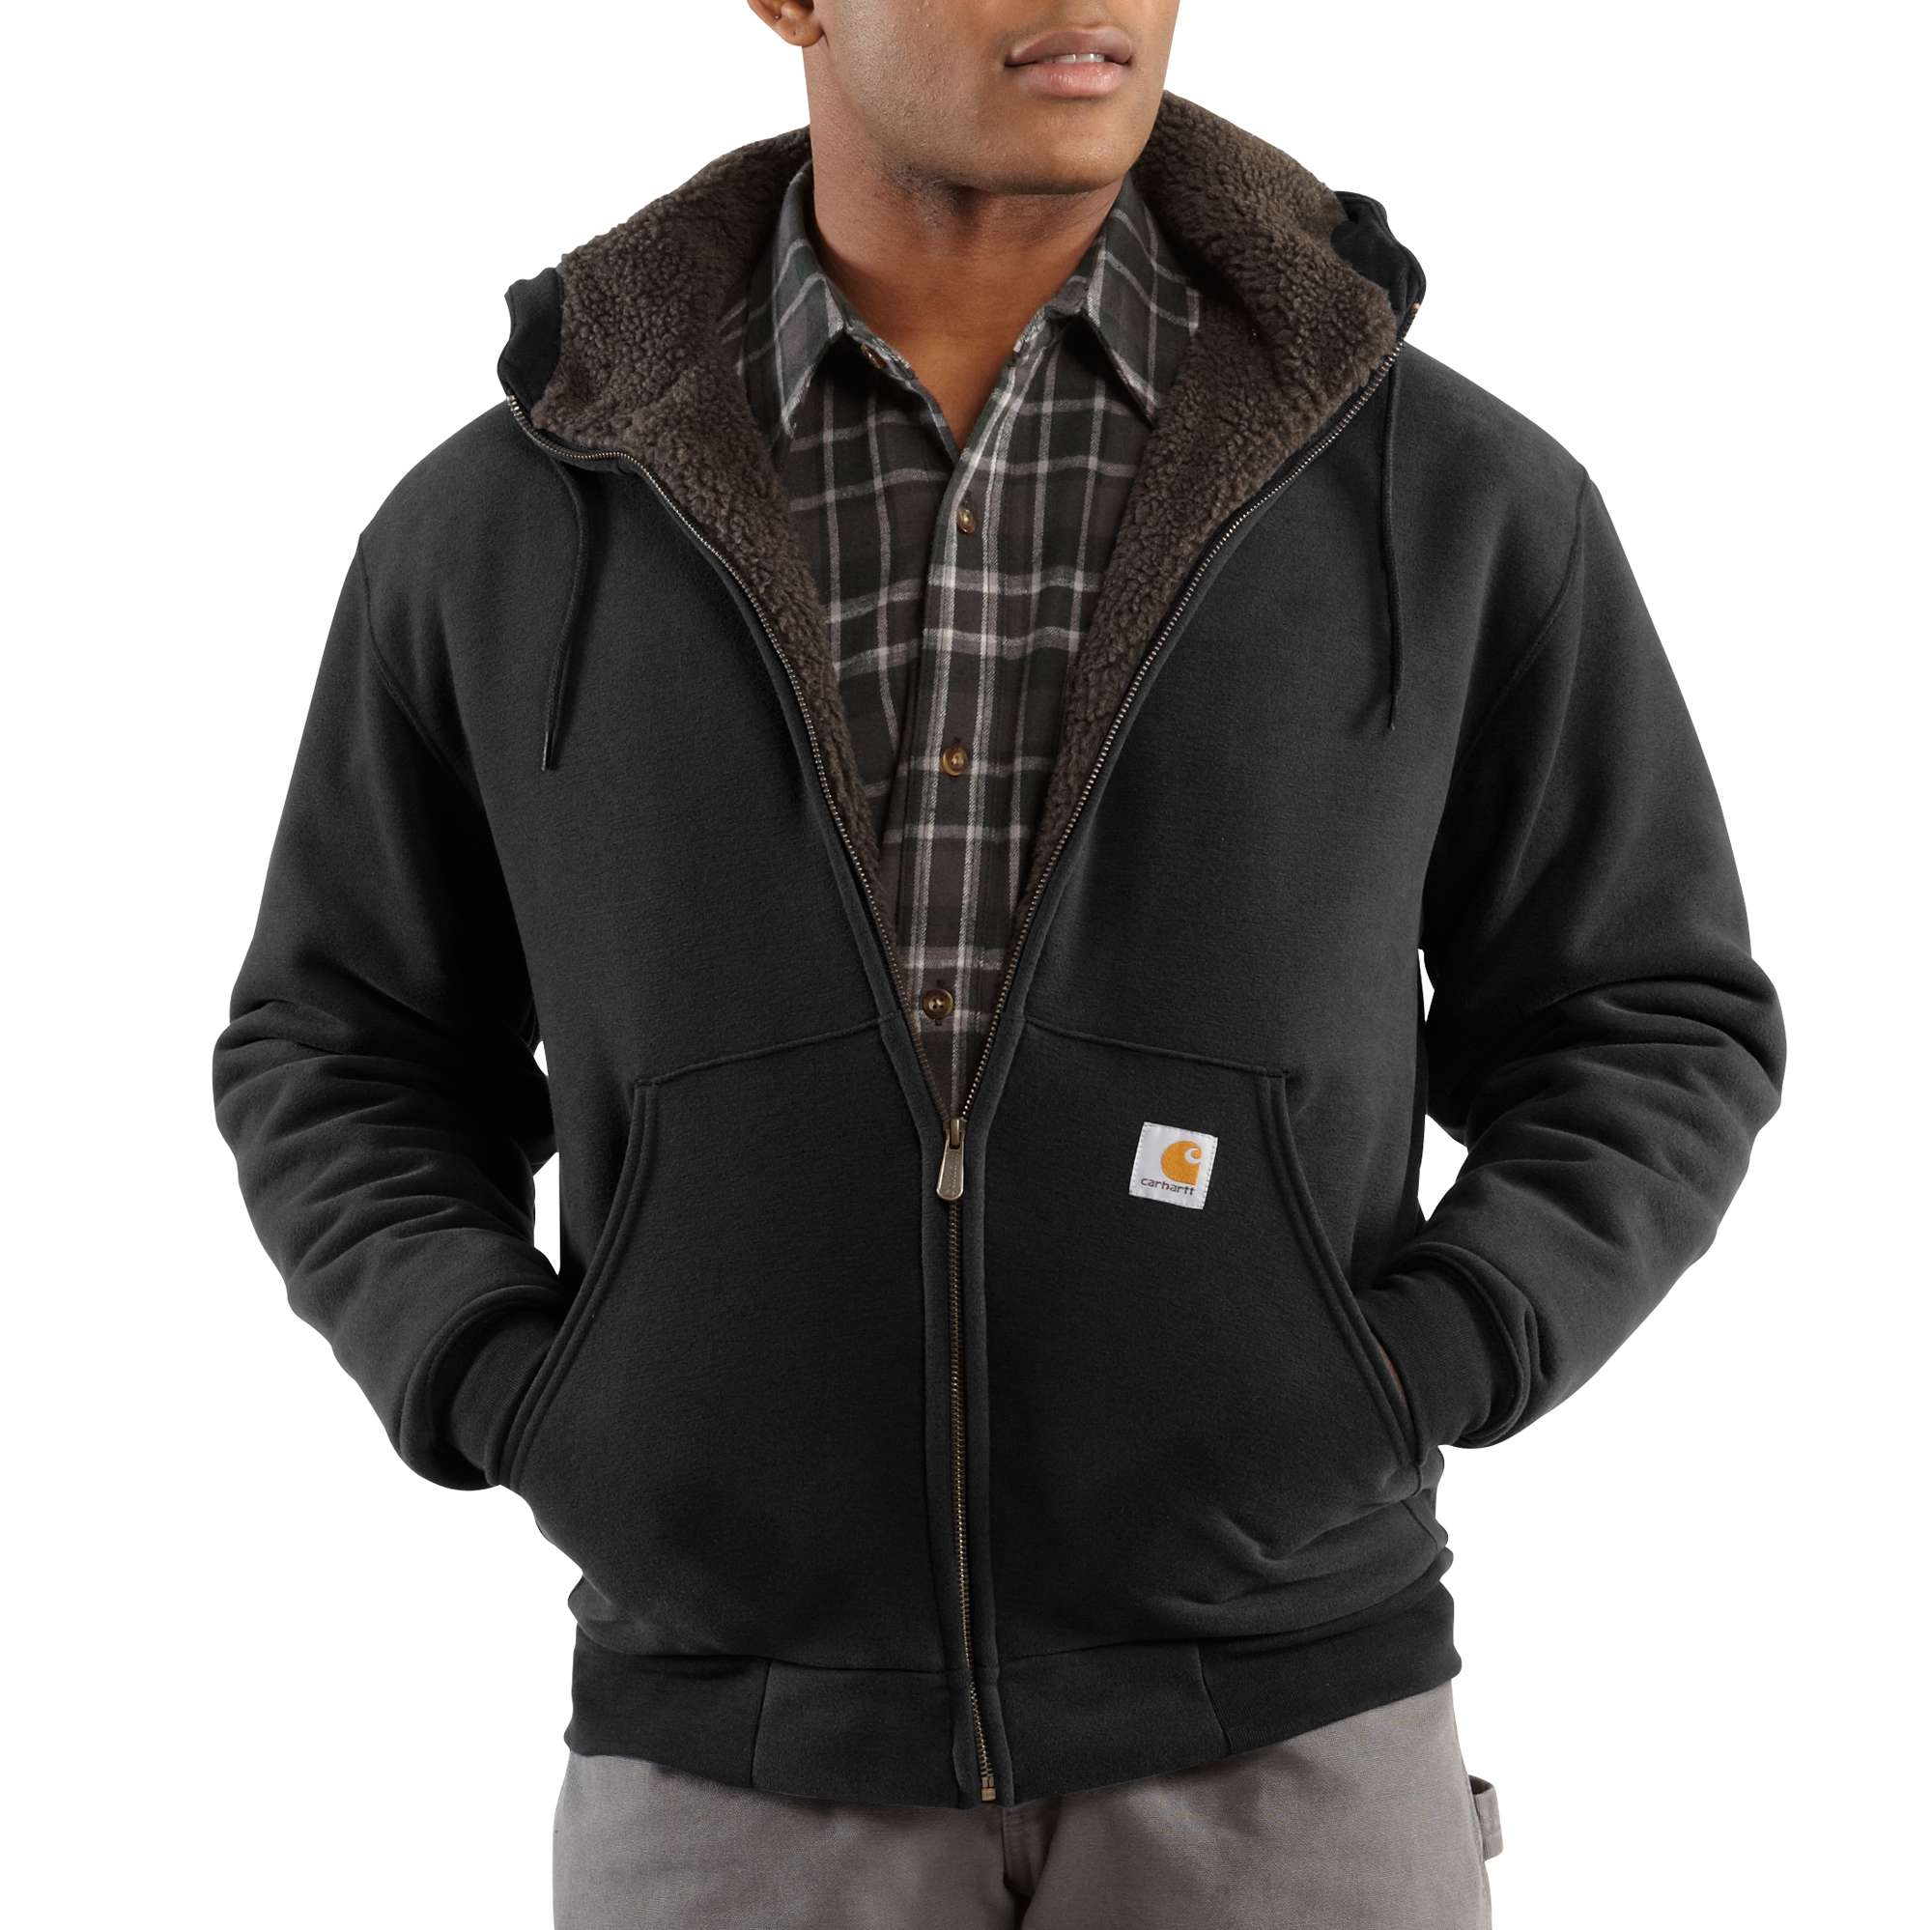 Carhartt Collinston Brushed Fleece Sherpa-lined Sweatshirt